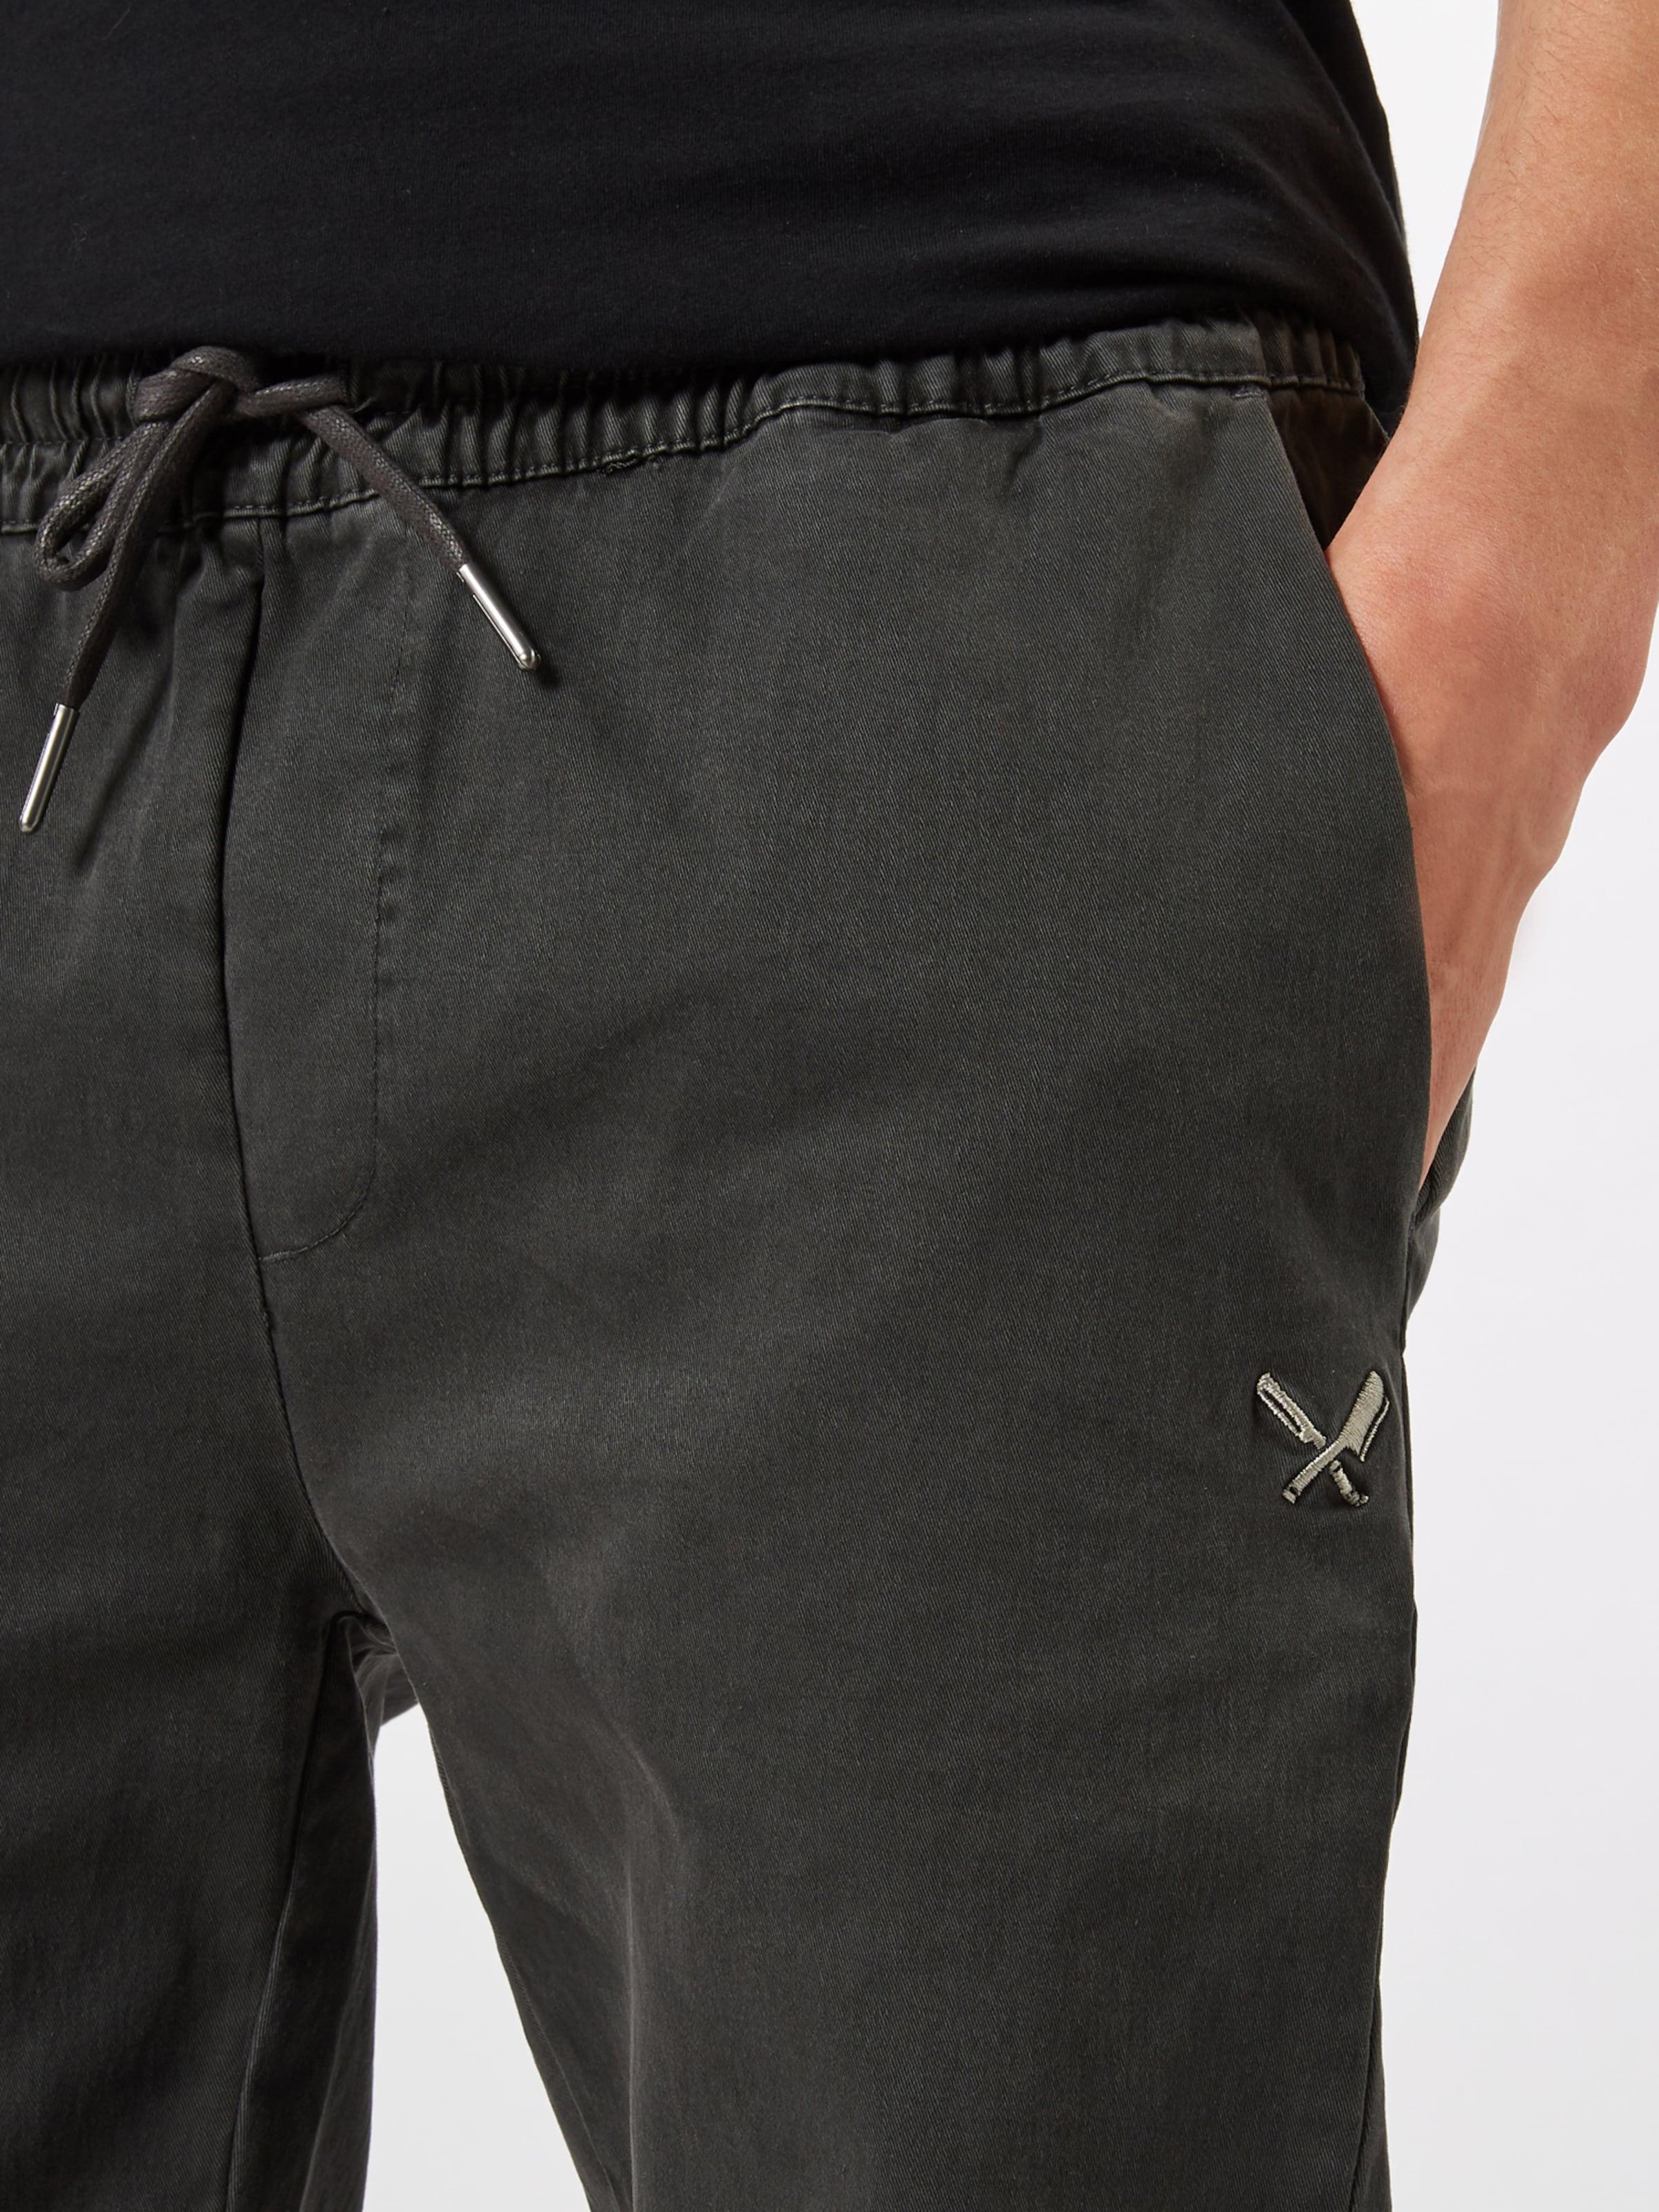 Distortedpeople 'classic' En Noir Pantalon En Distortedpeople Pantalon 'classic' Noir xoedWBCr